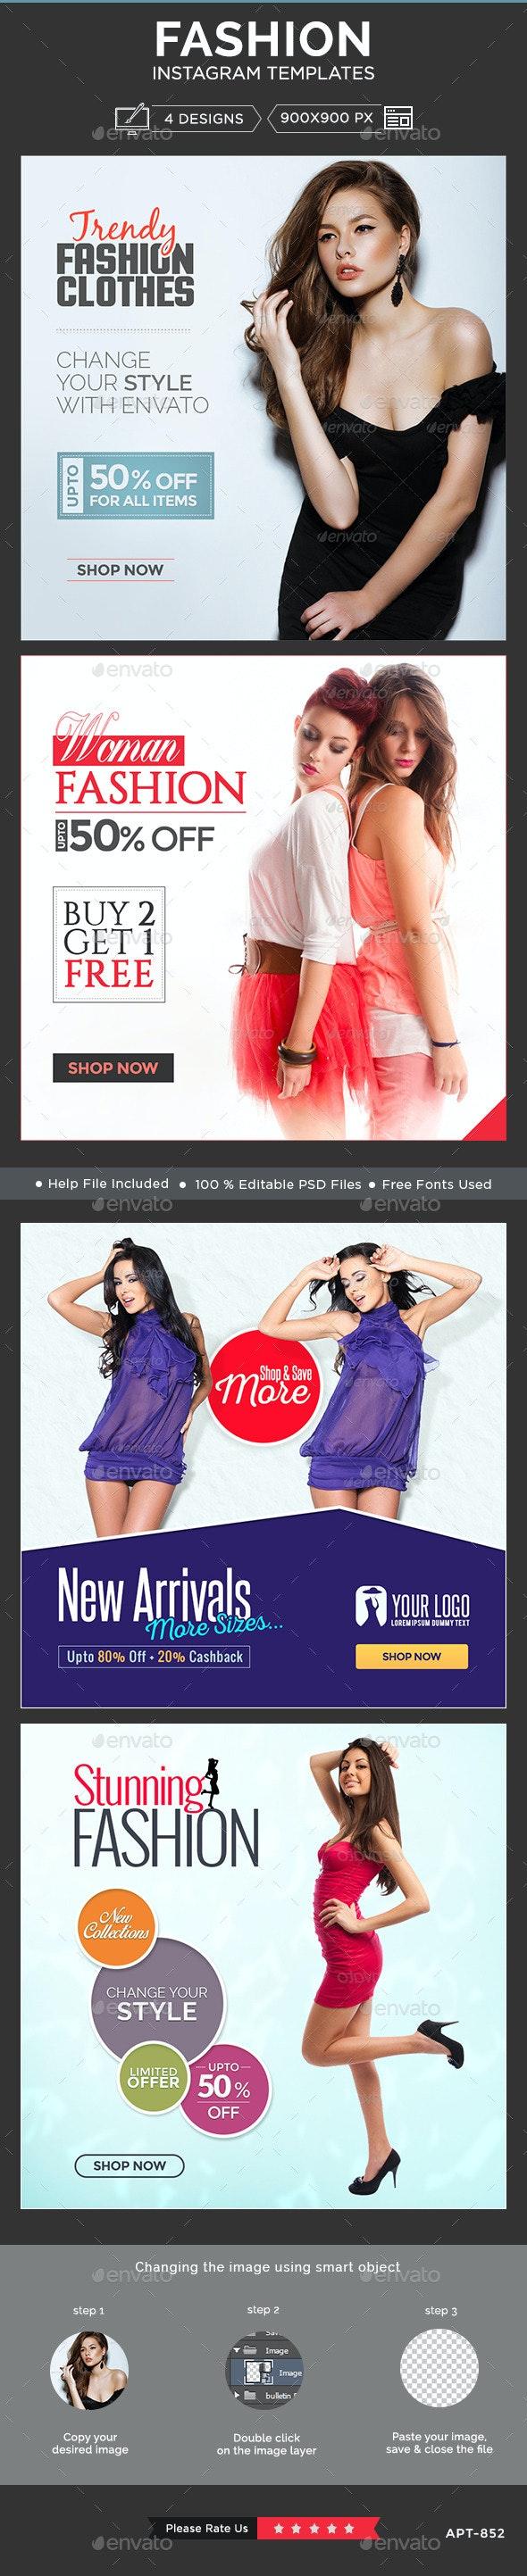 Fashion Instagram Templates - 4 Designs - Banners & Ads Web Elements